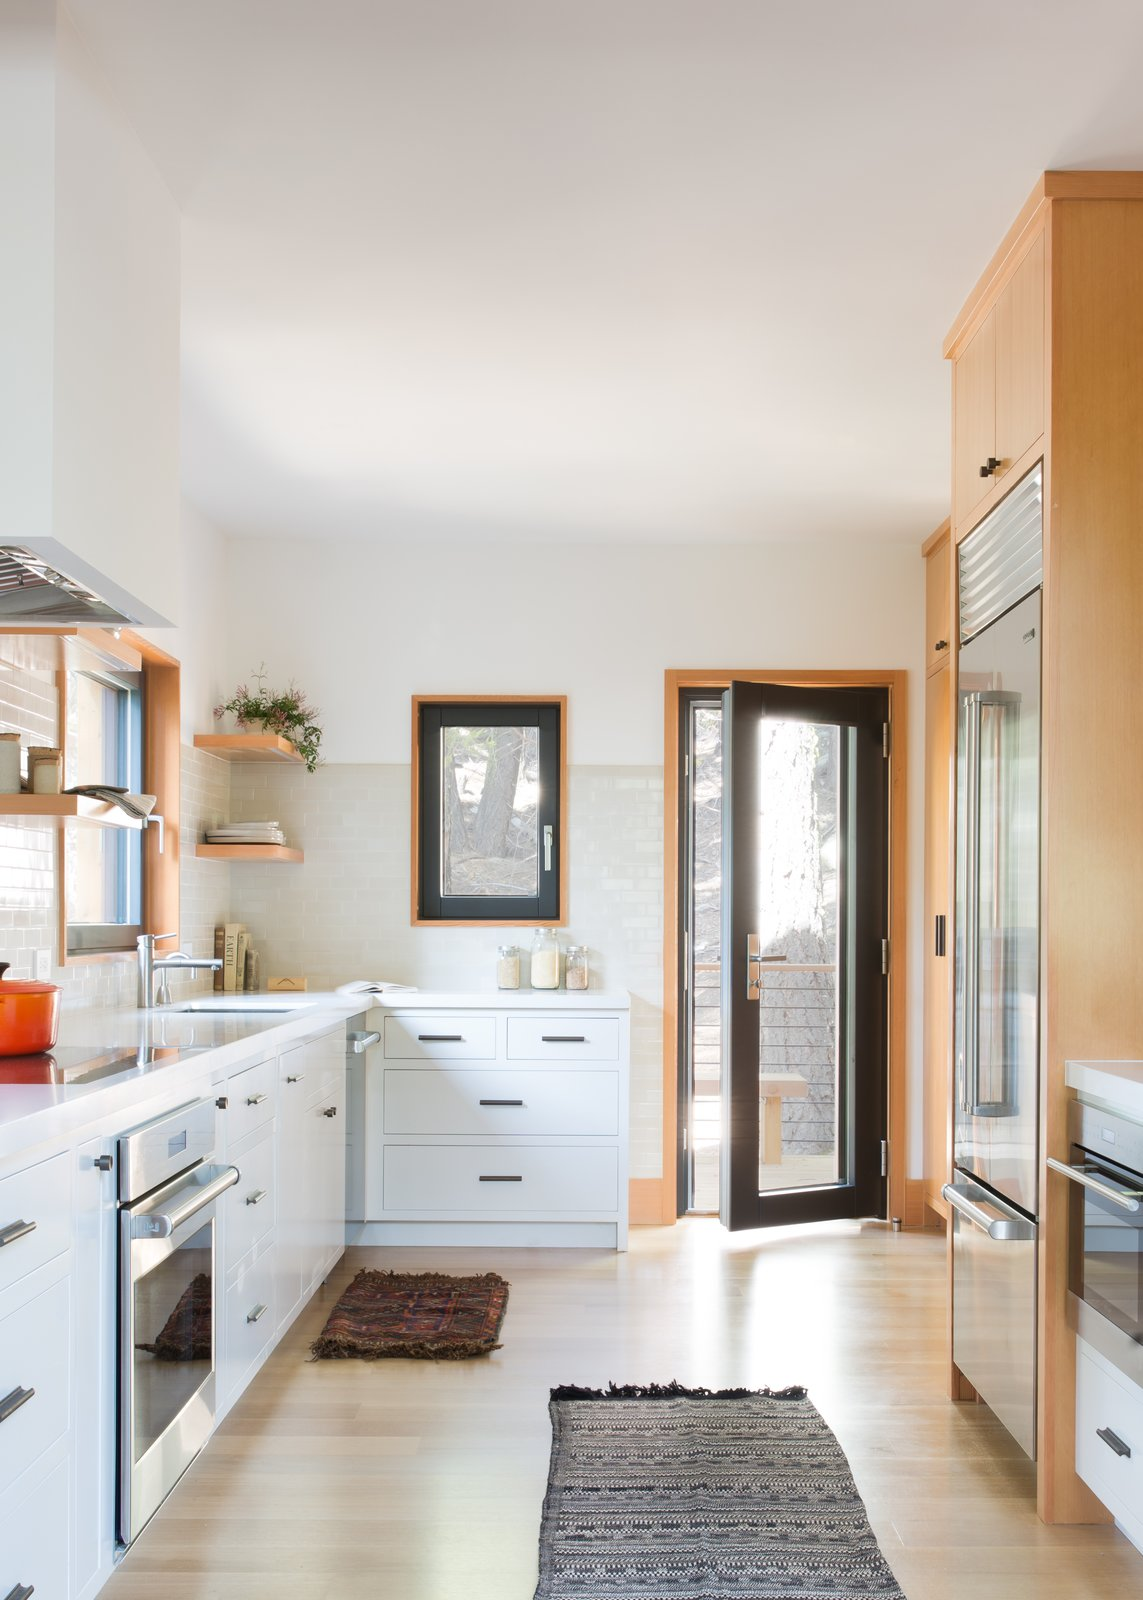 Kitchen, White Cabinet, Ceramic Tile Backsplashe, Undermount Sink, Light Hardwood Floor, and Refrigerator  Woodsy Tahoe Cabin by Regan Baker Design